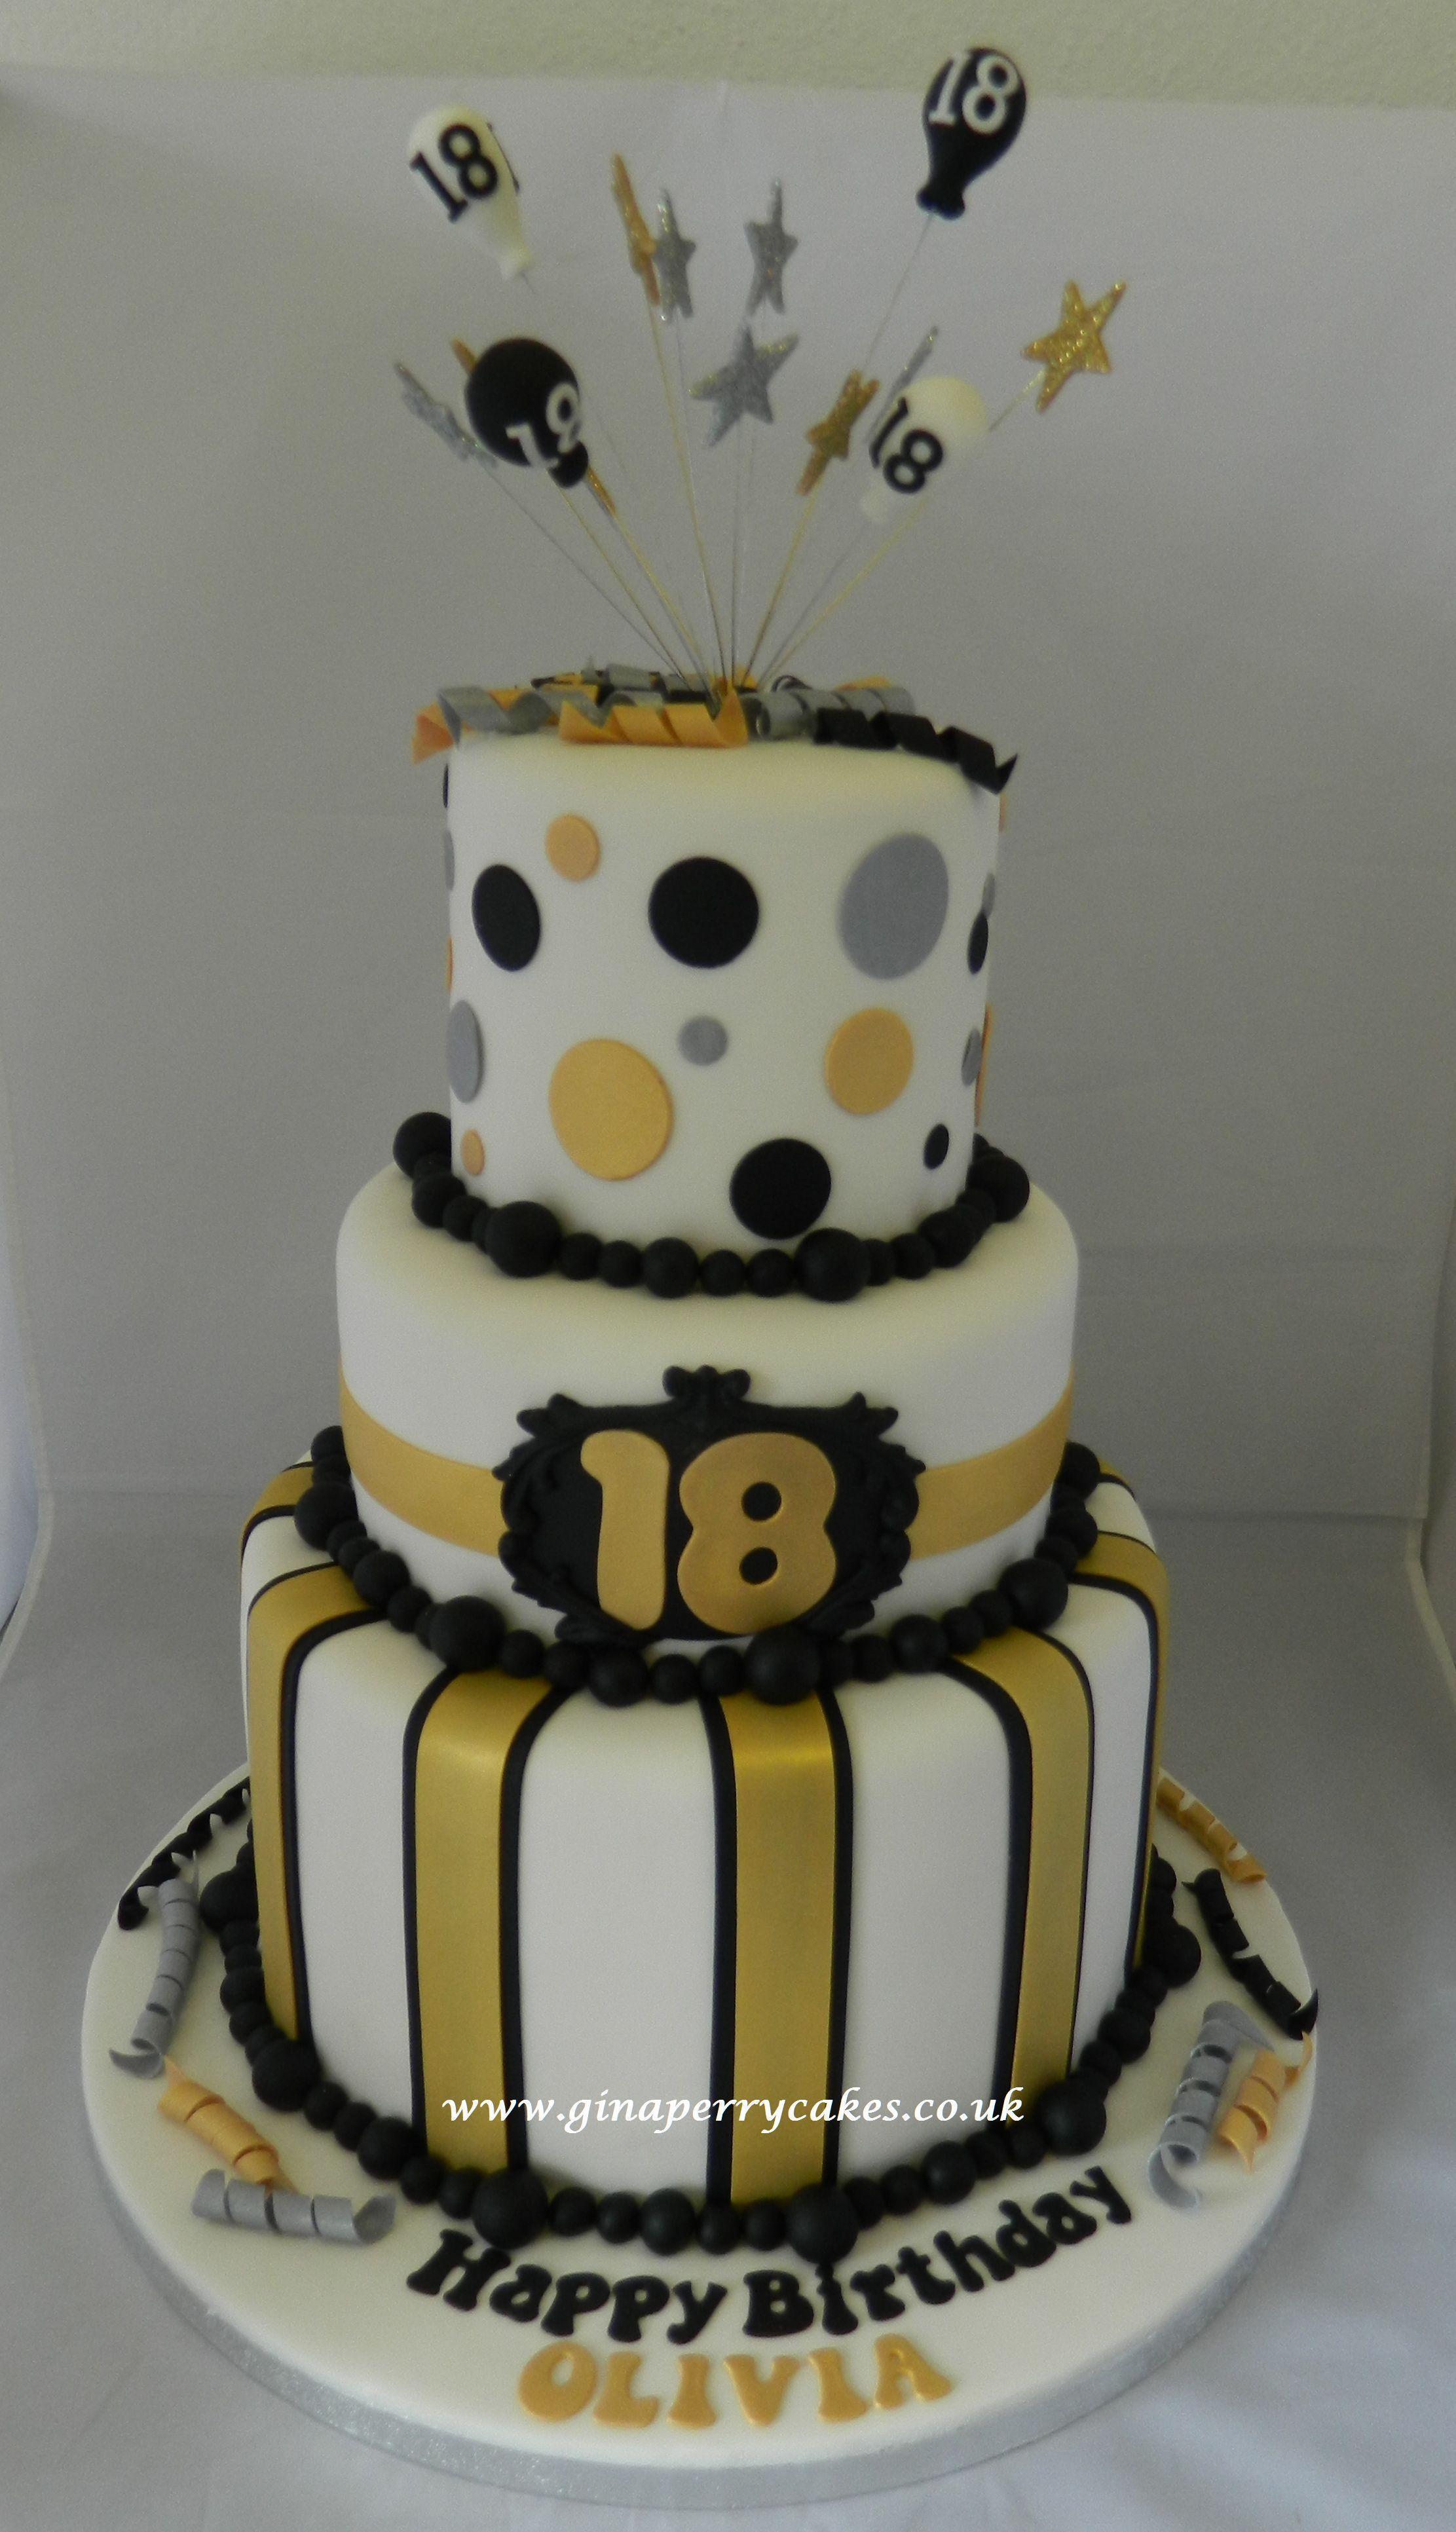 Image Result For 18th Birthday Cake For Men Gold Black And White Geburtstagstorte Geburtstag Torte Junge Blatt Kuchen